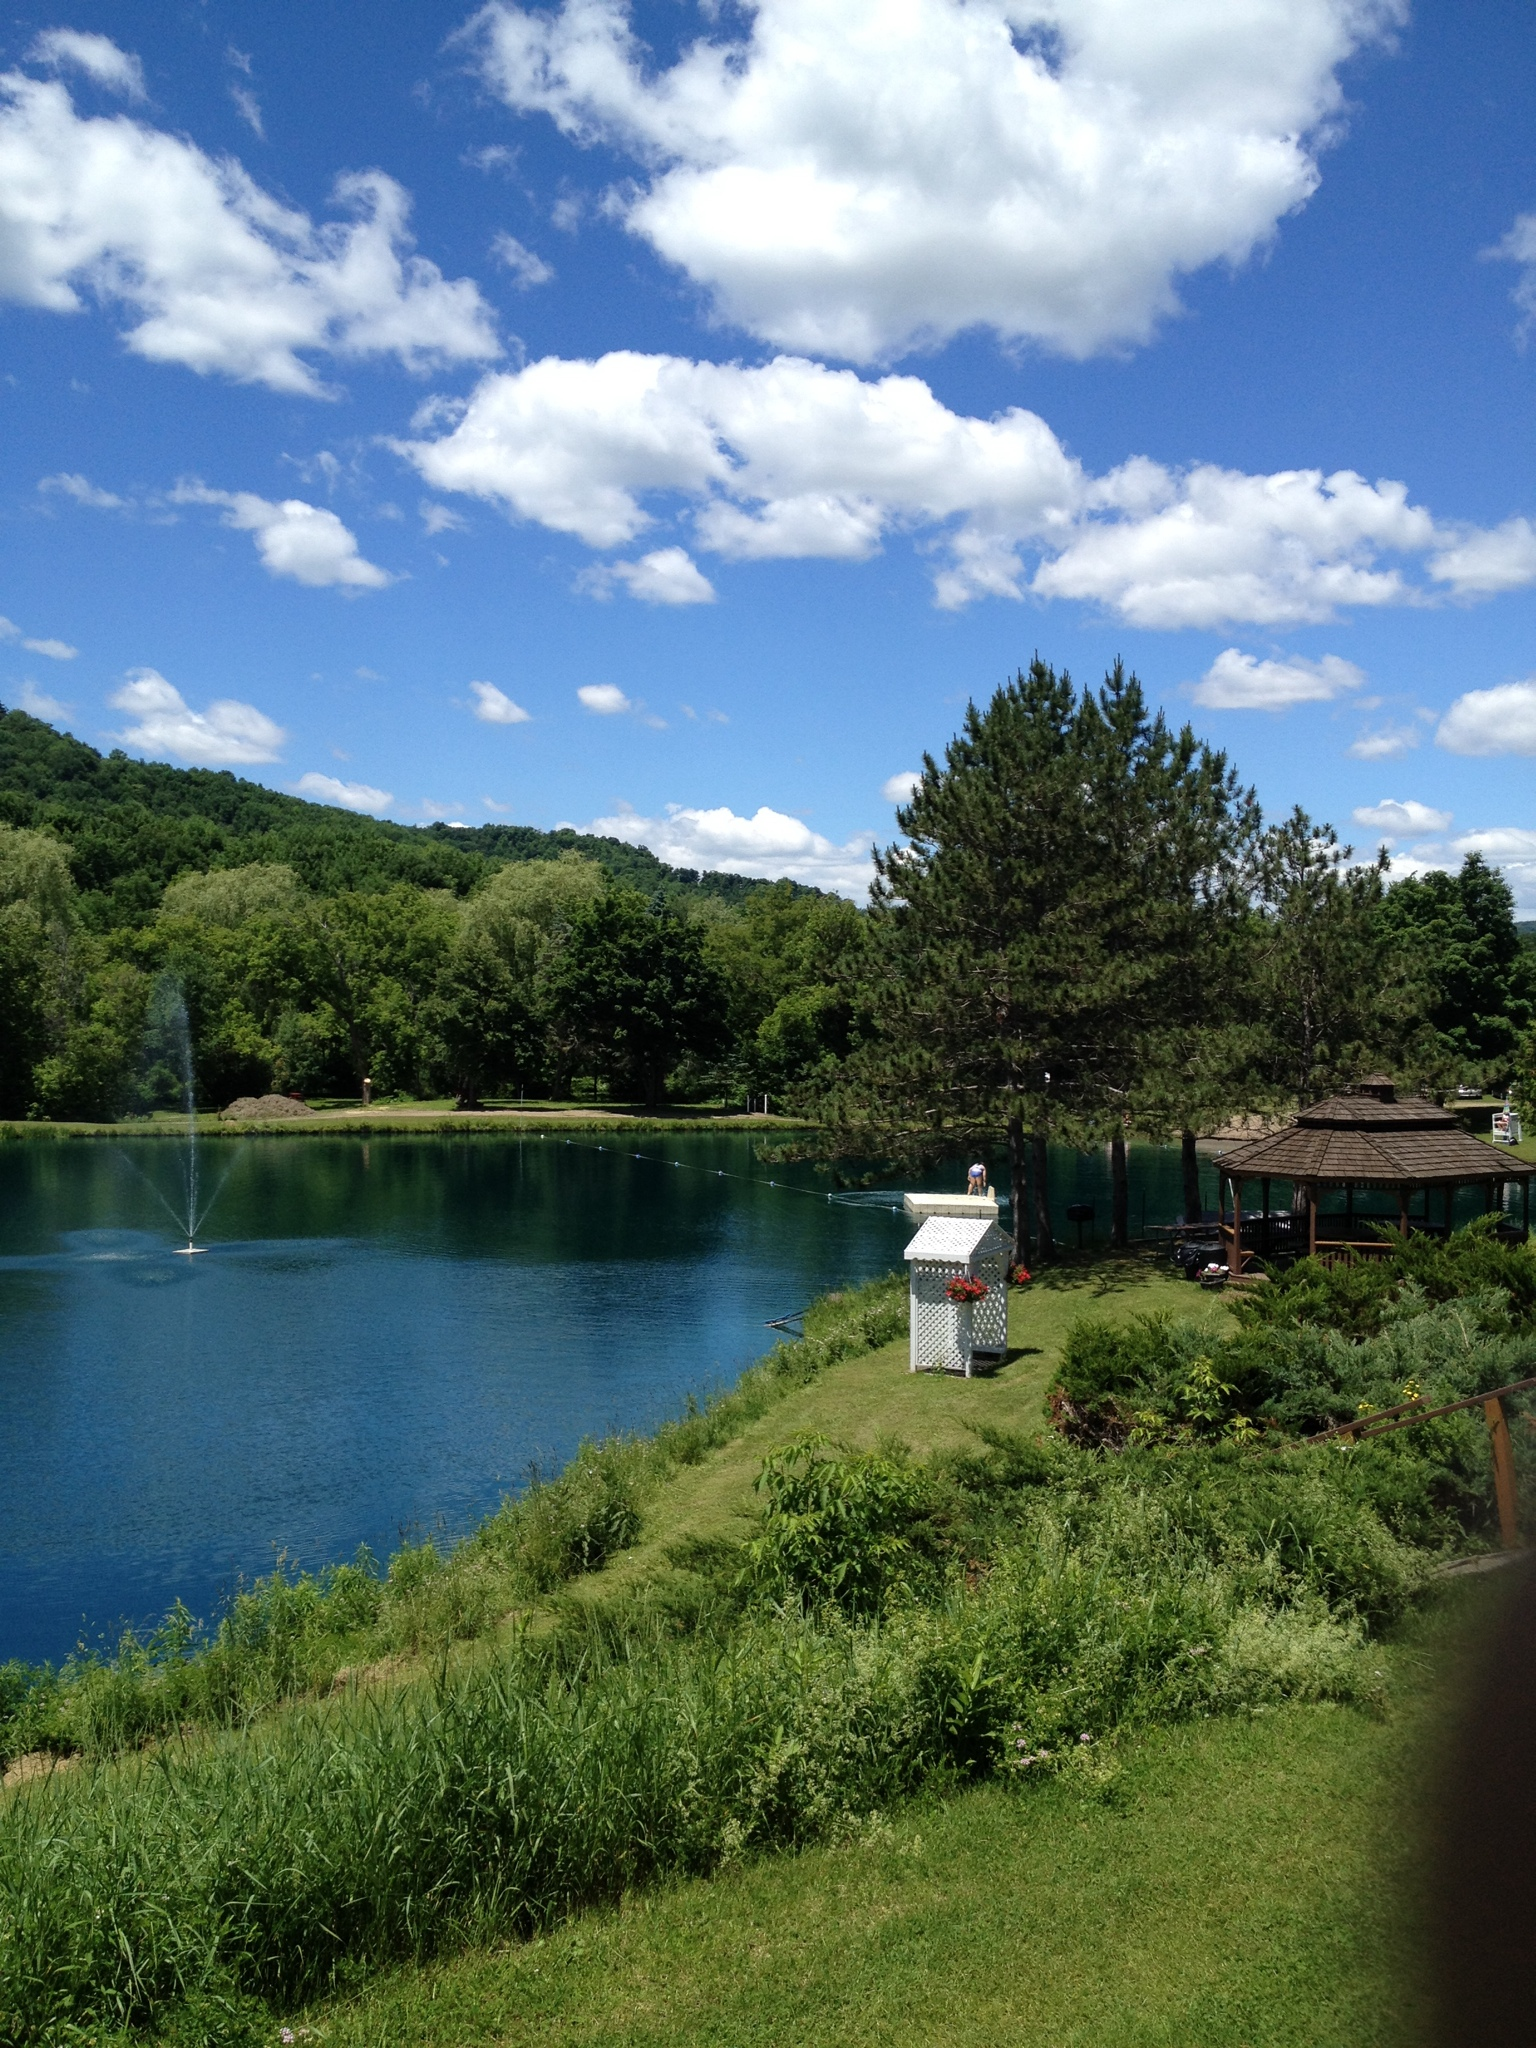 Lake Chalet Motel & Campground, Cassville NY